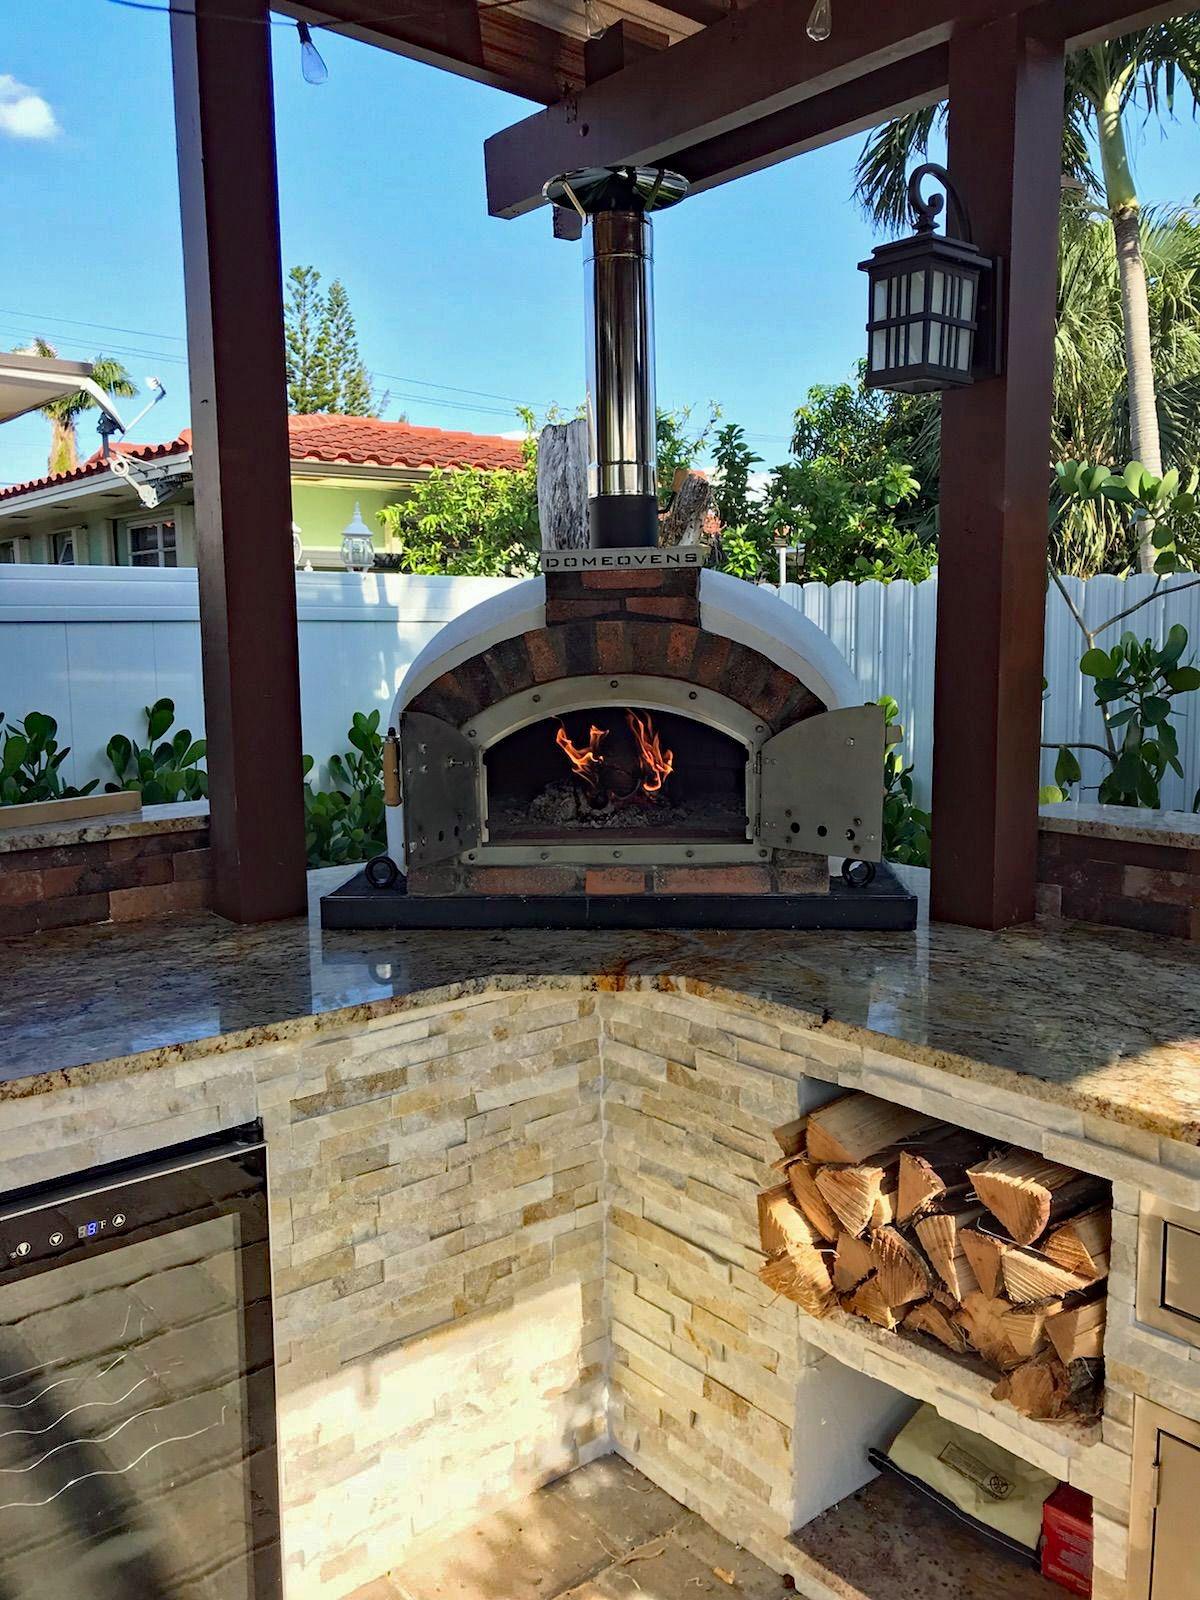 Brick Pizza Oven Avanzini Gas Burner